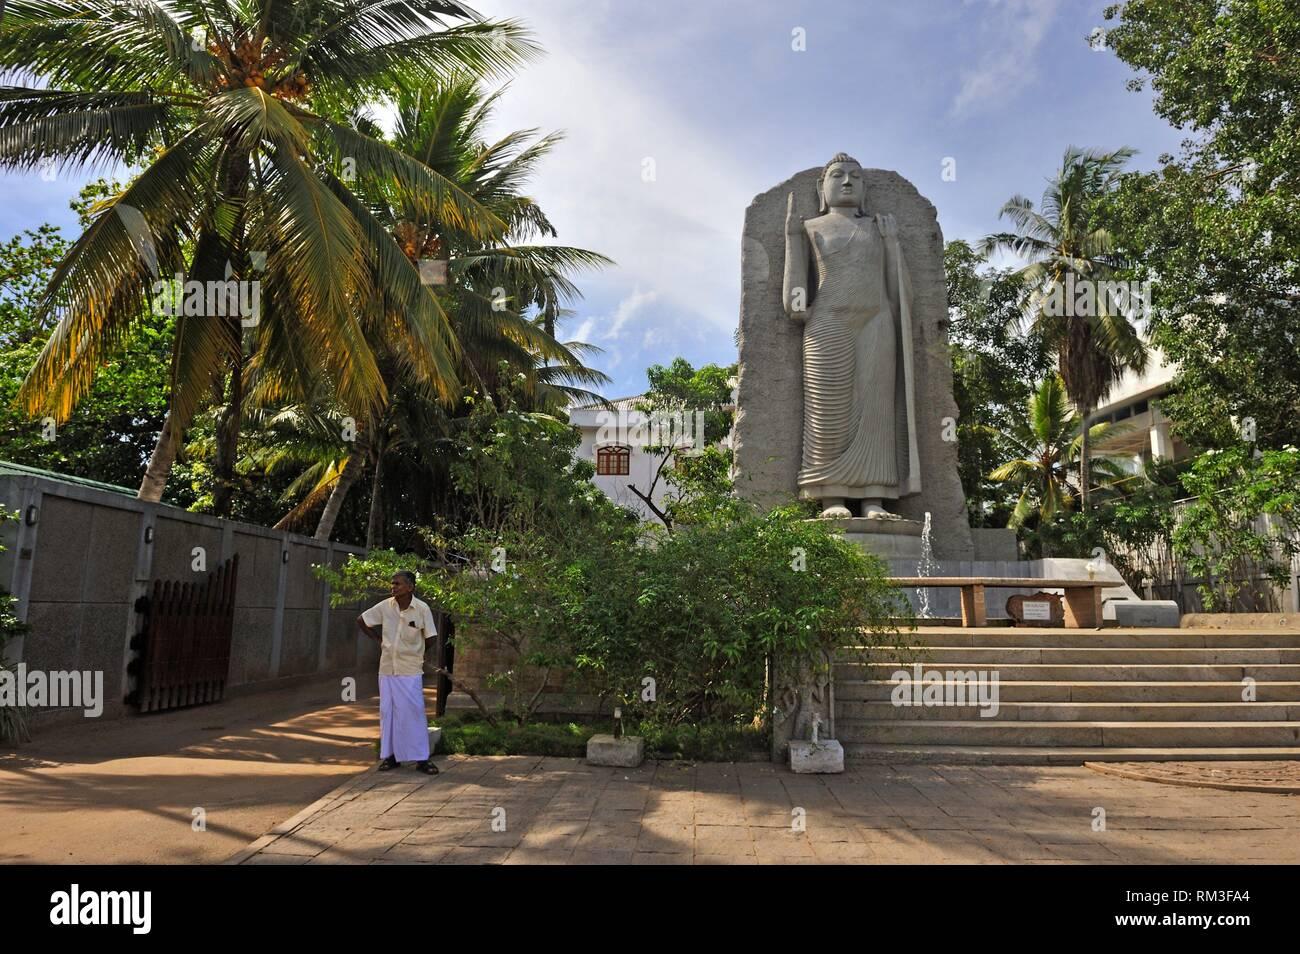 Colombo, Sri Lanka, Indian subcontinent, South Asia. - Stock Image